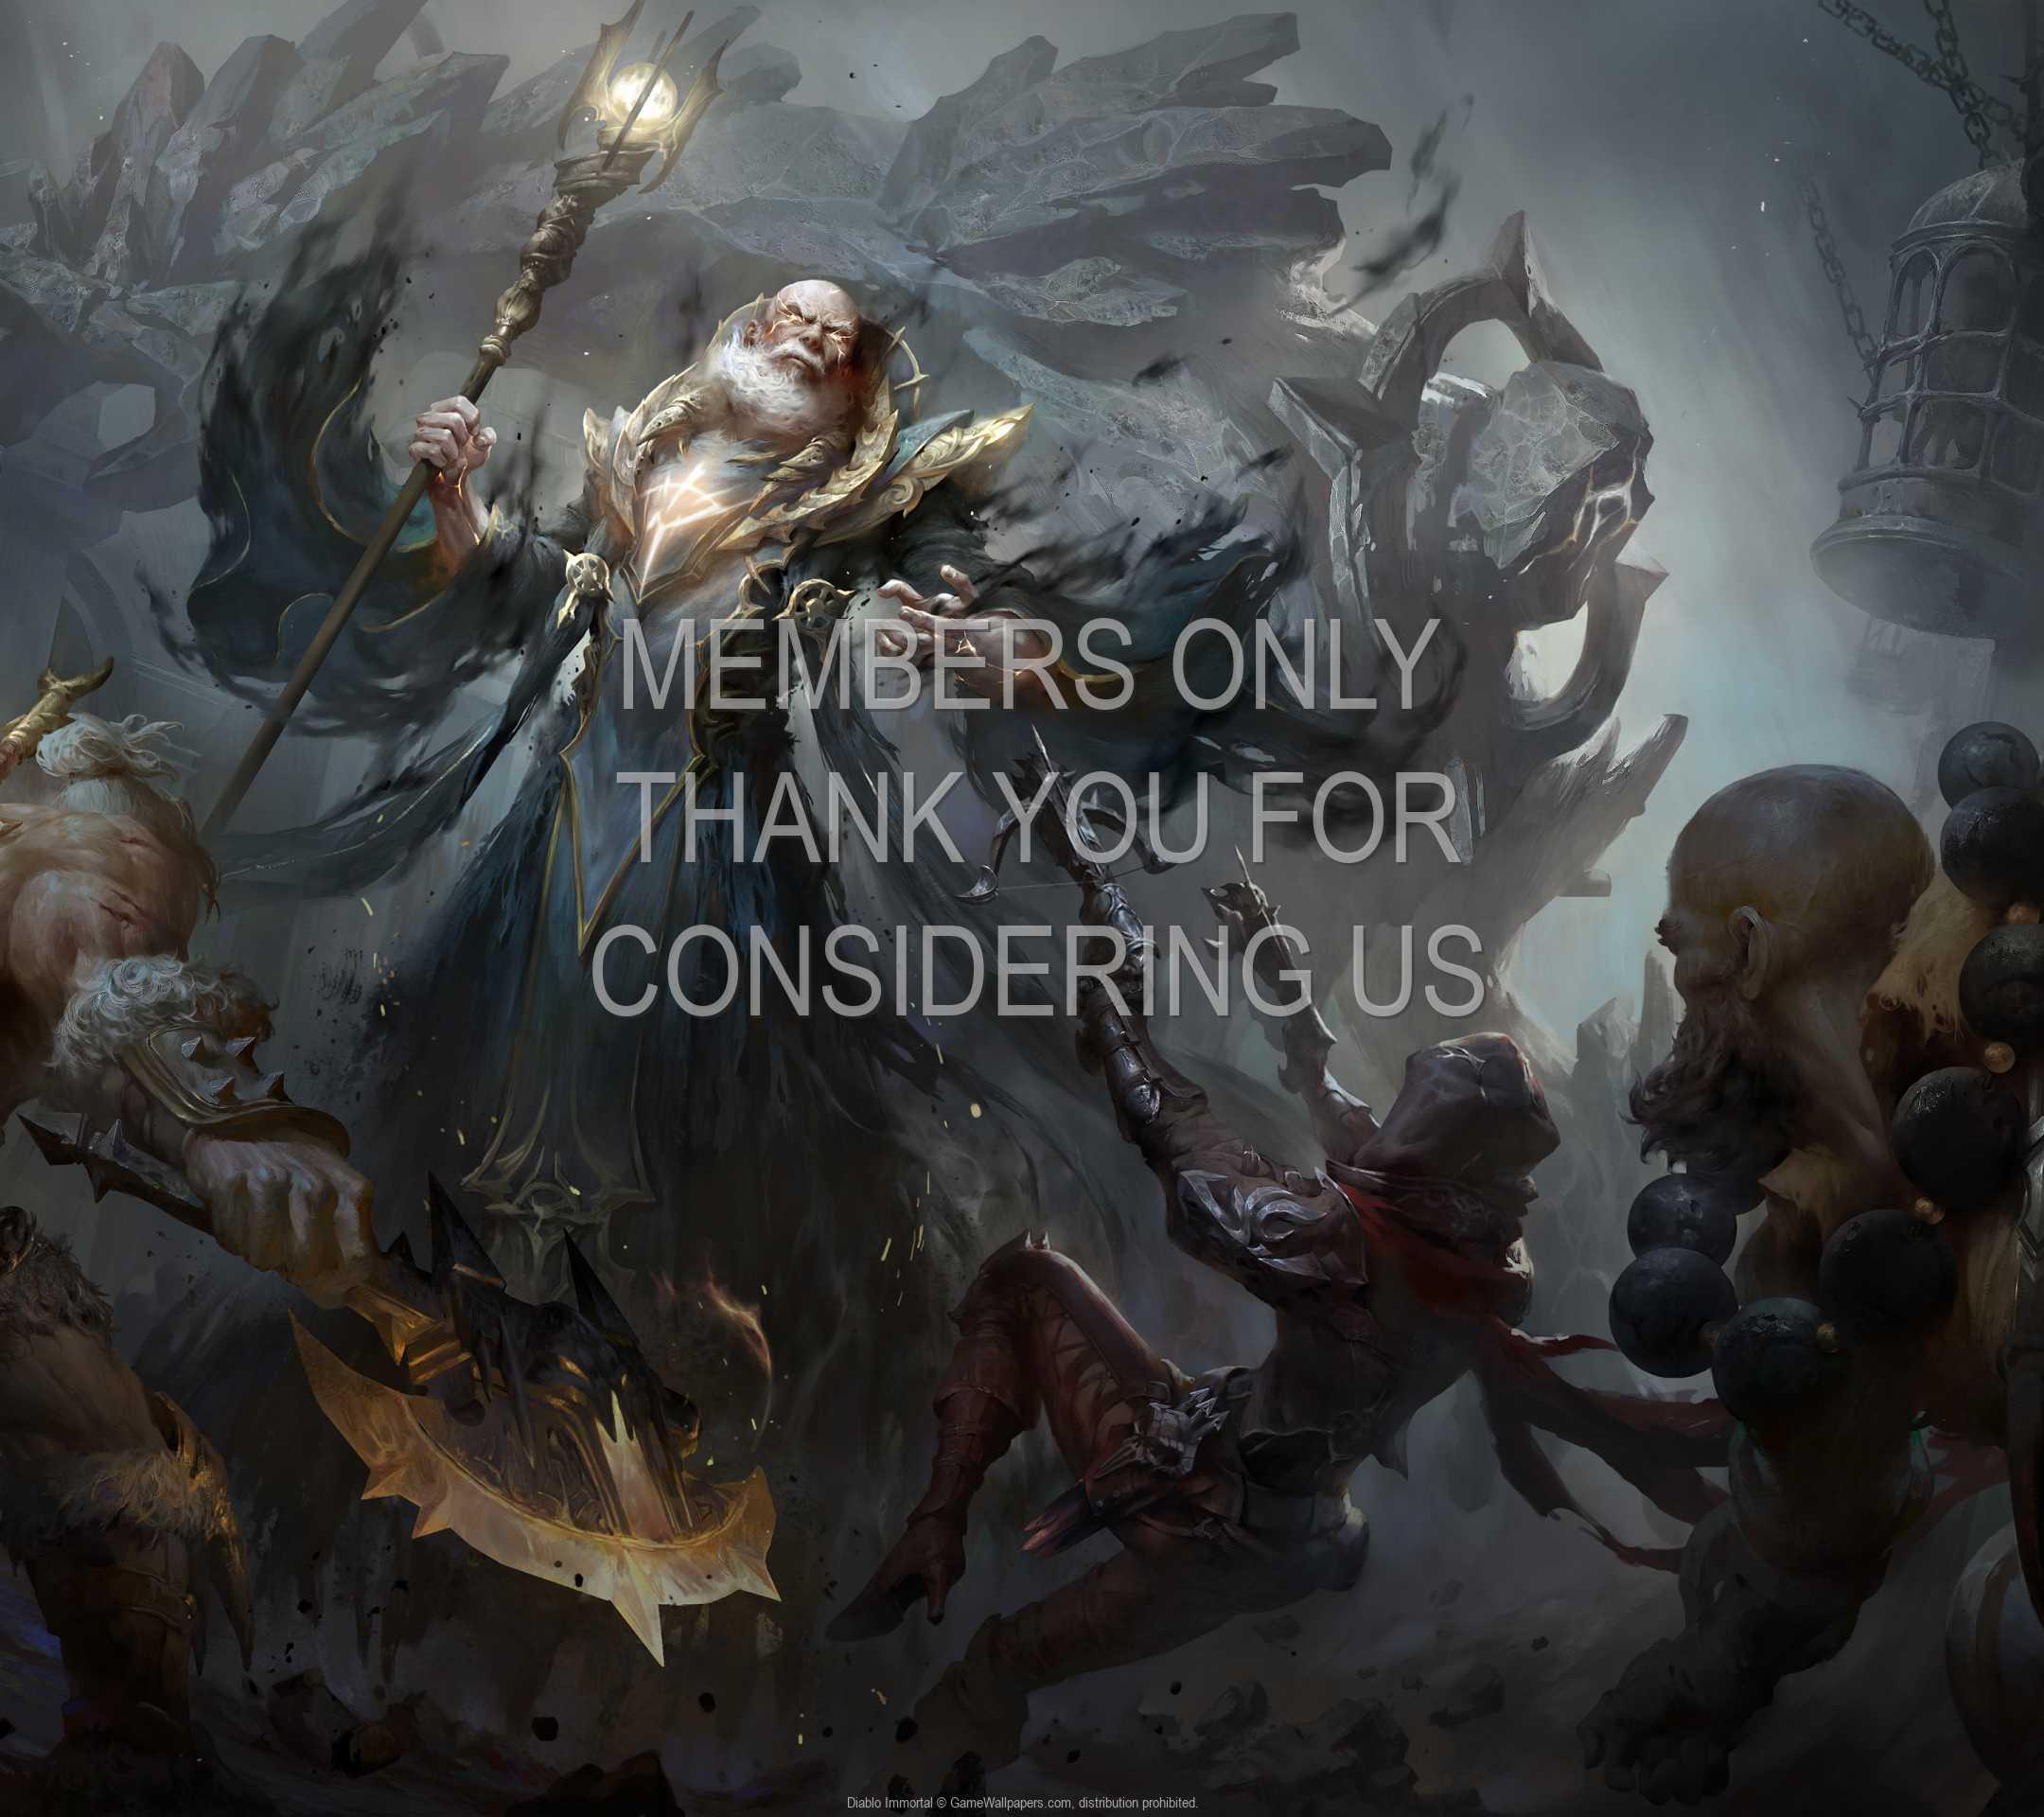 Diablo Immortal 1080p Horizontal Mobile wallpaper or background 02